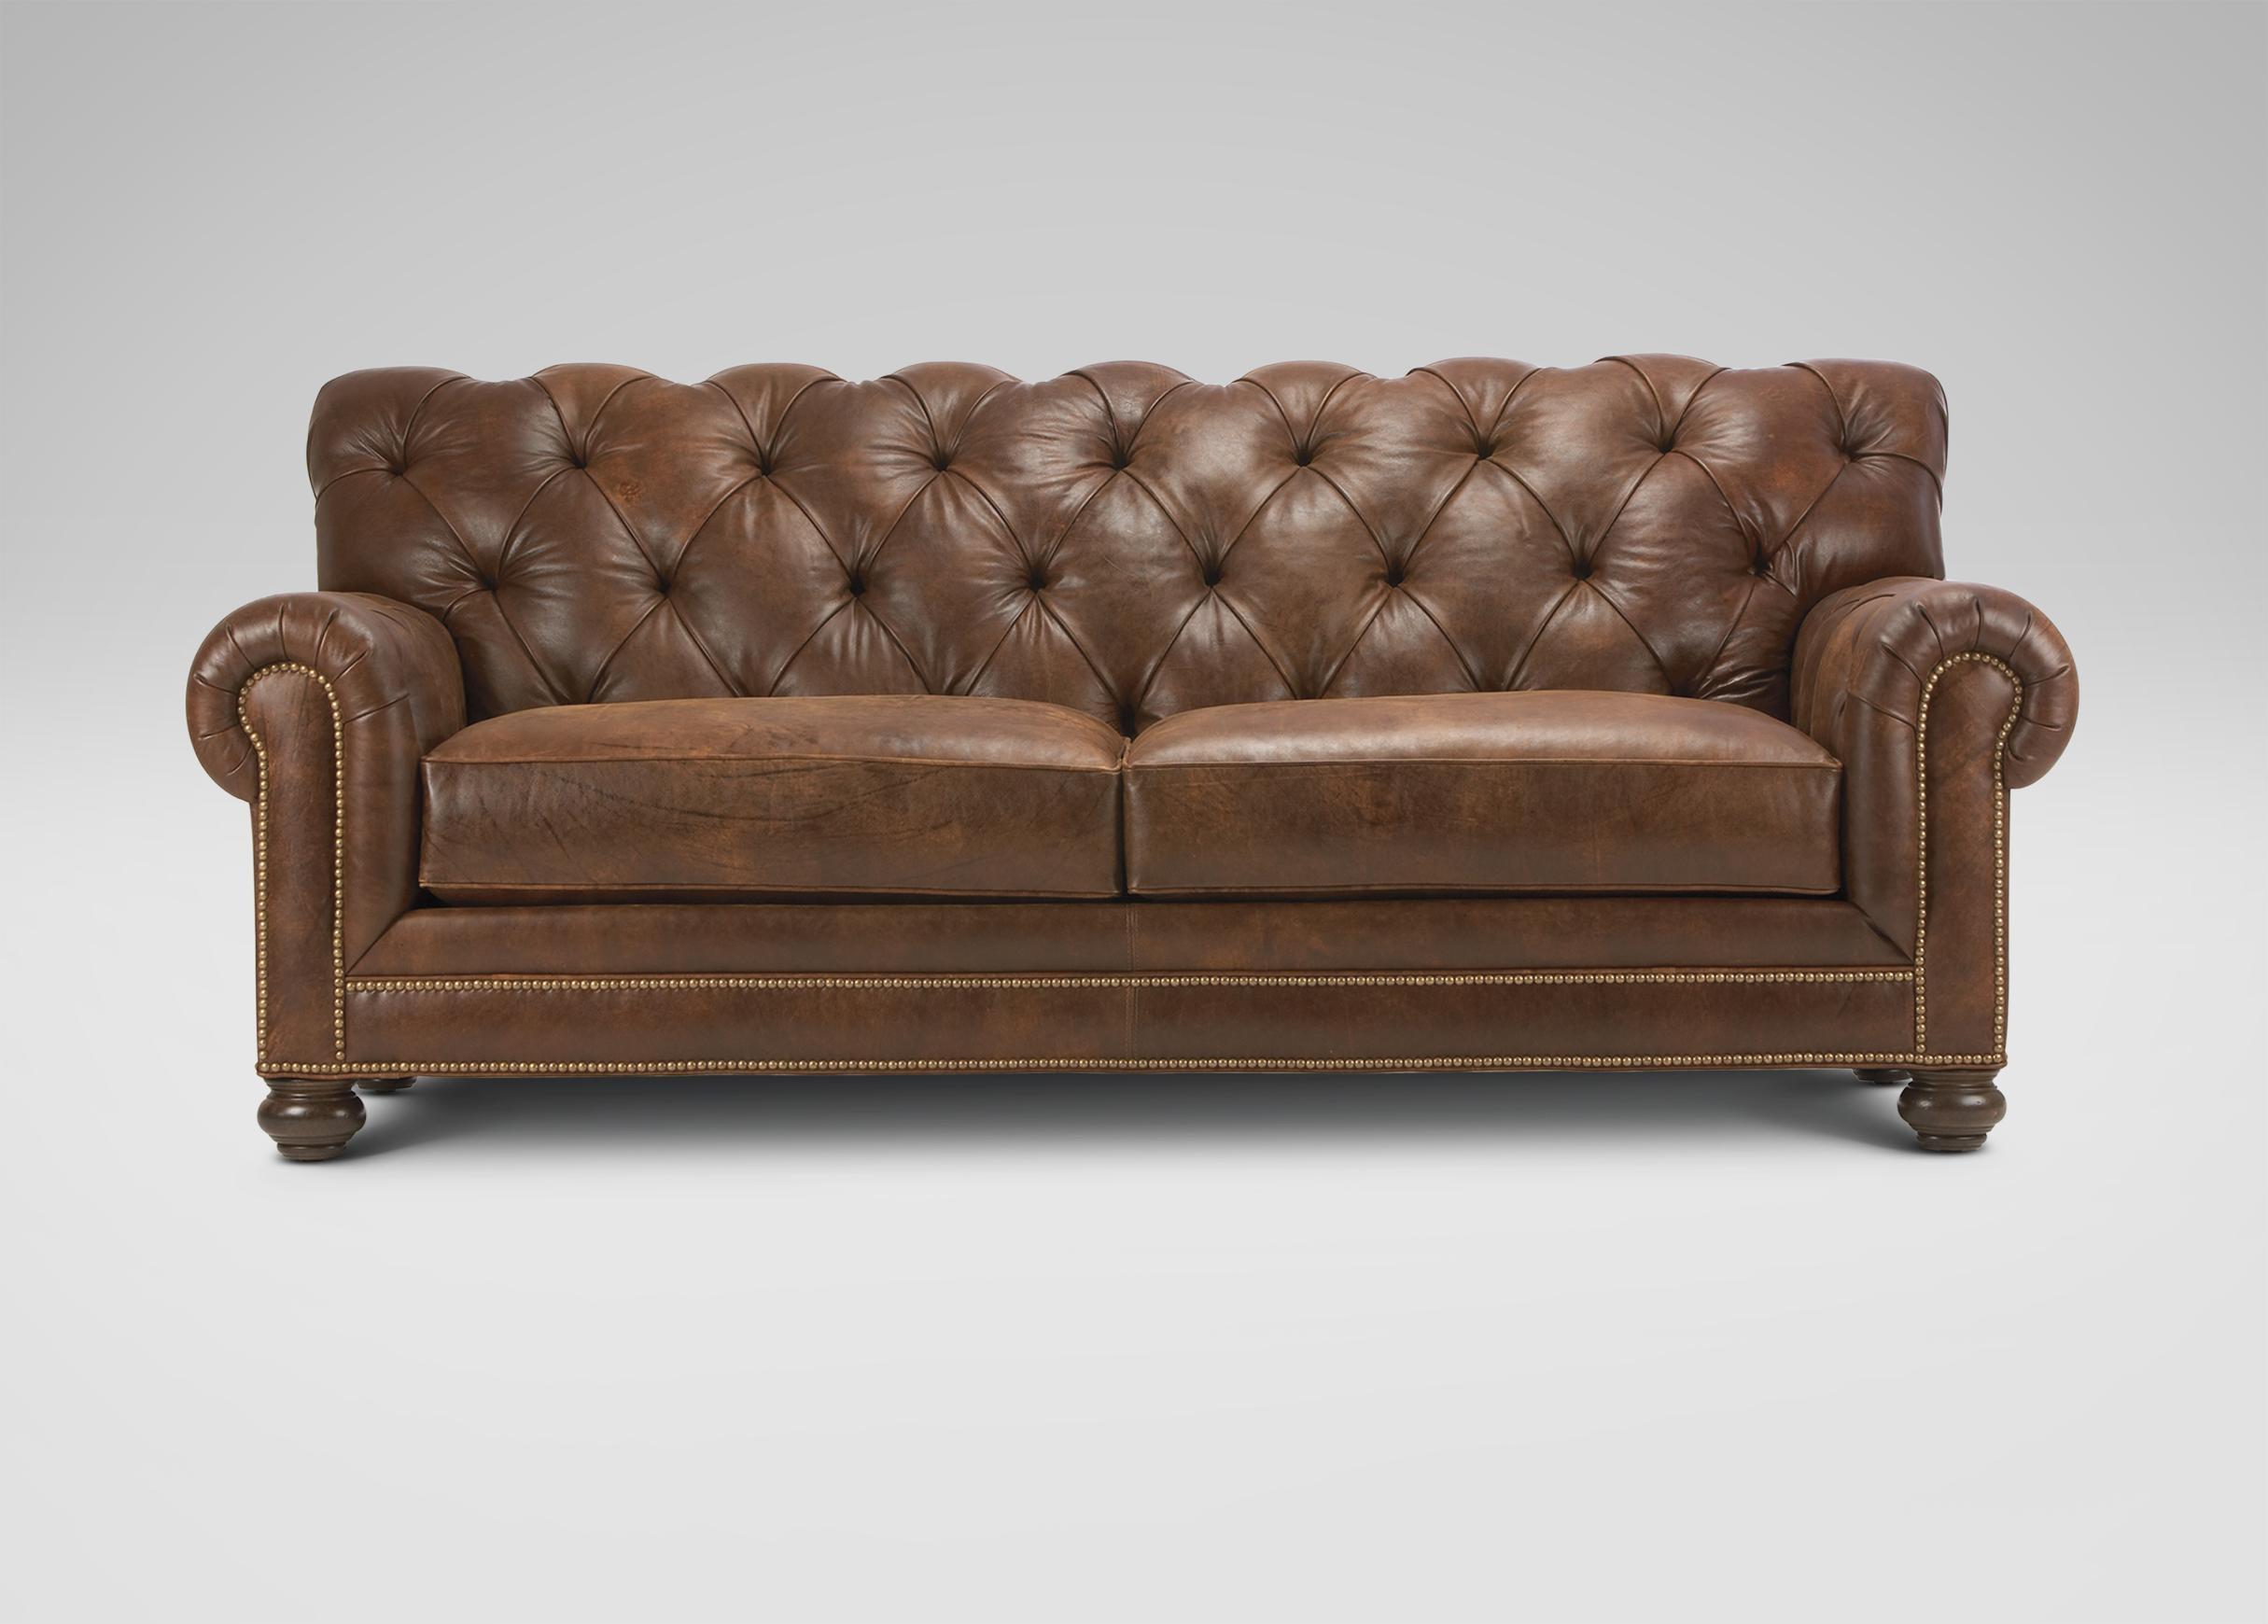 Chadwick Leather Sofa | Sofas & Loveseats Regarding Leather Sofas (Image 5 of 21)